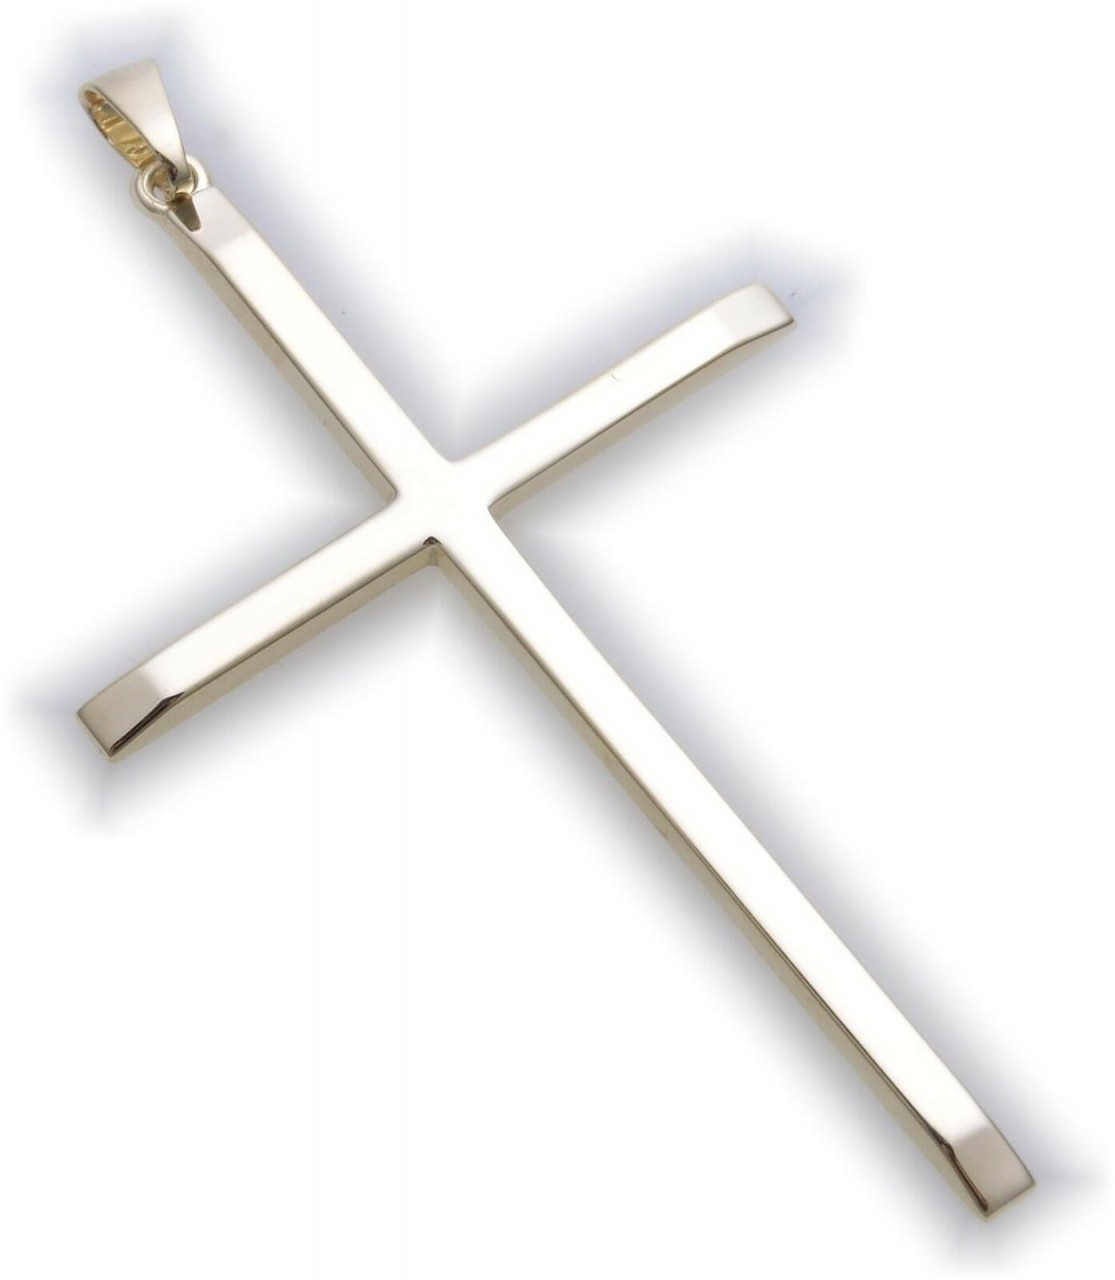 Anhänger Kreuz echt Gold 333 55 mm Gelbgold Unisex